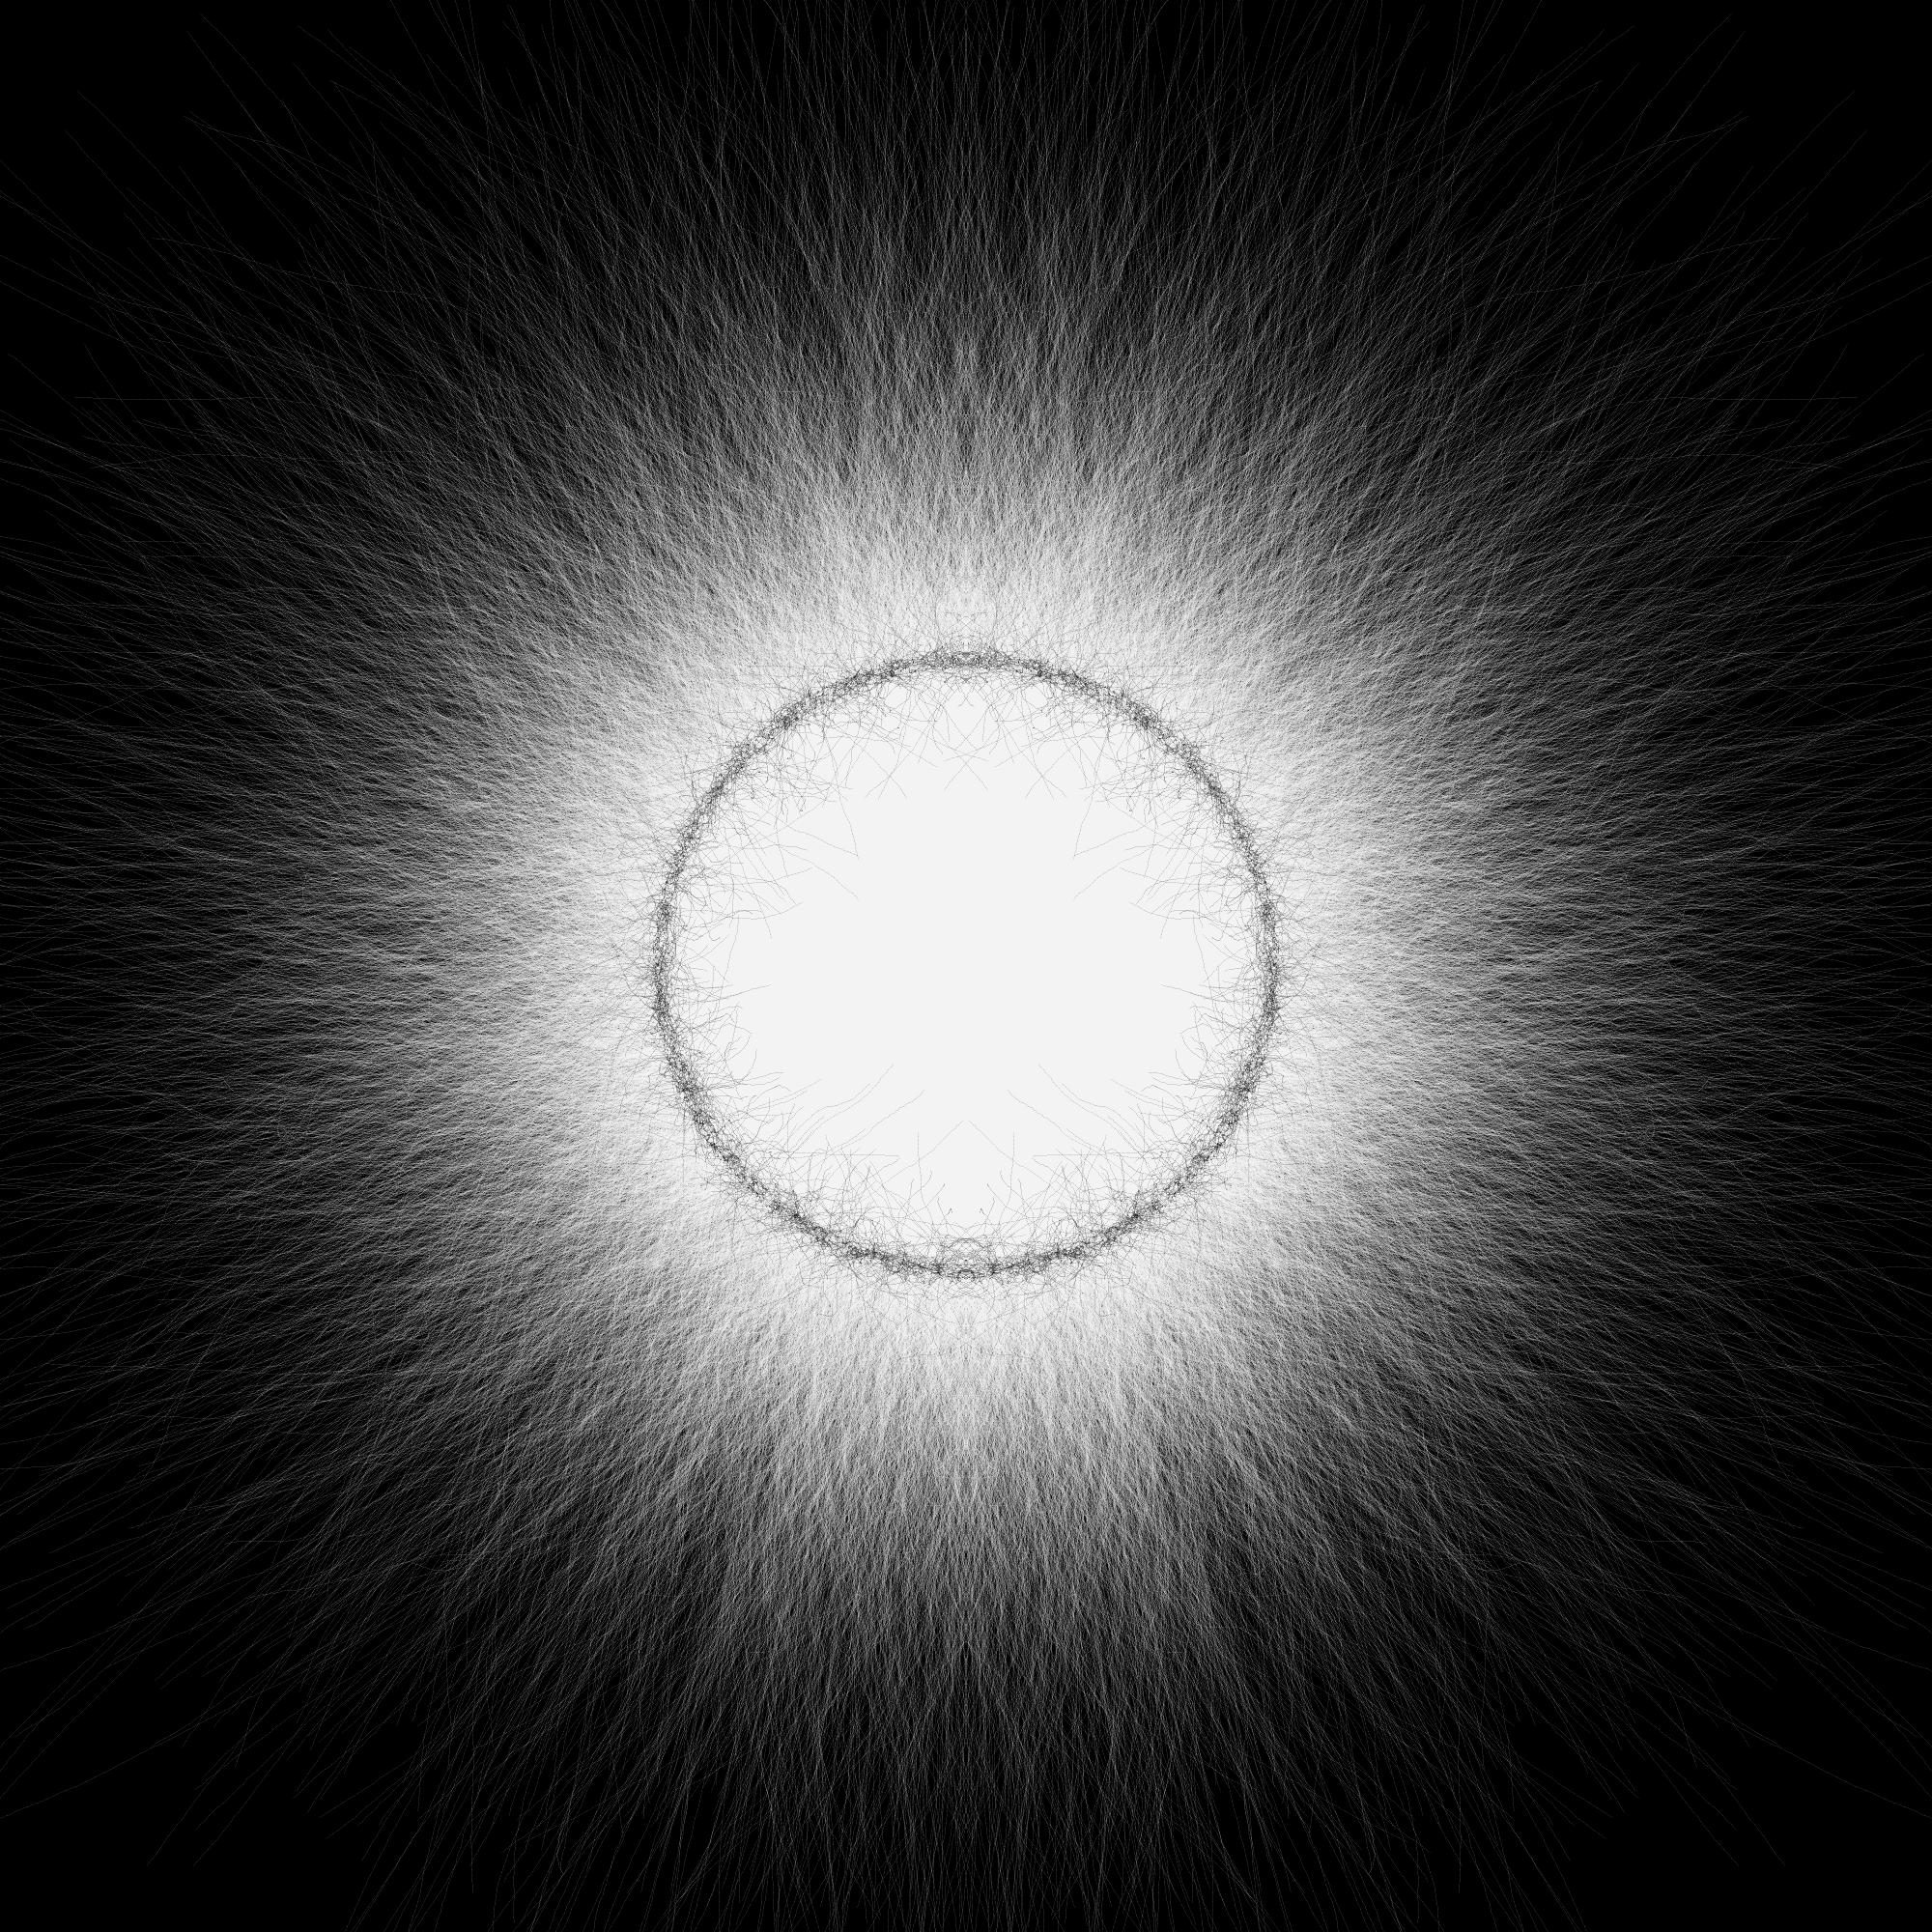 binaryAge-001473